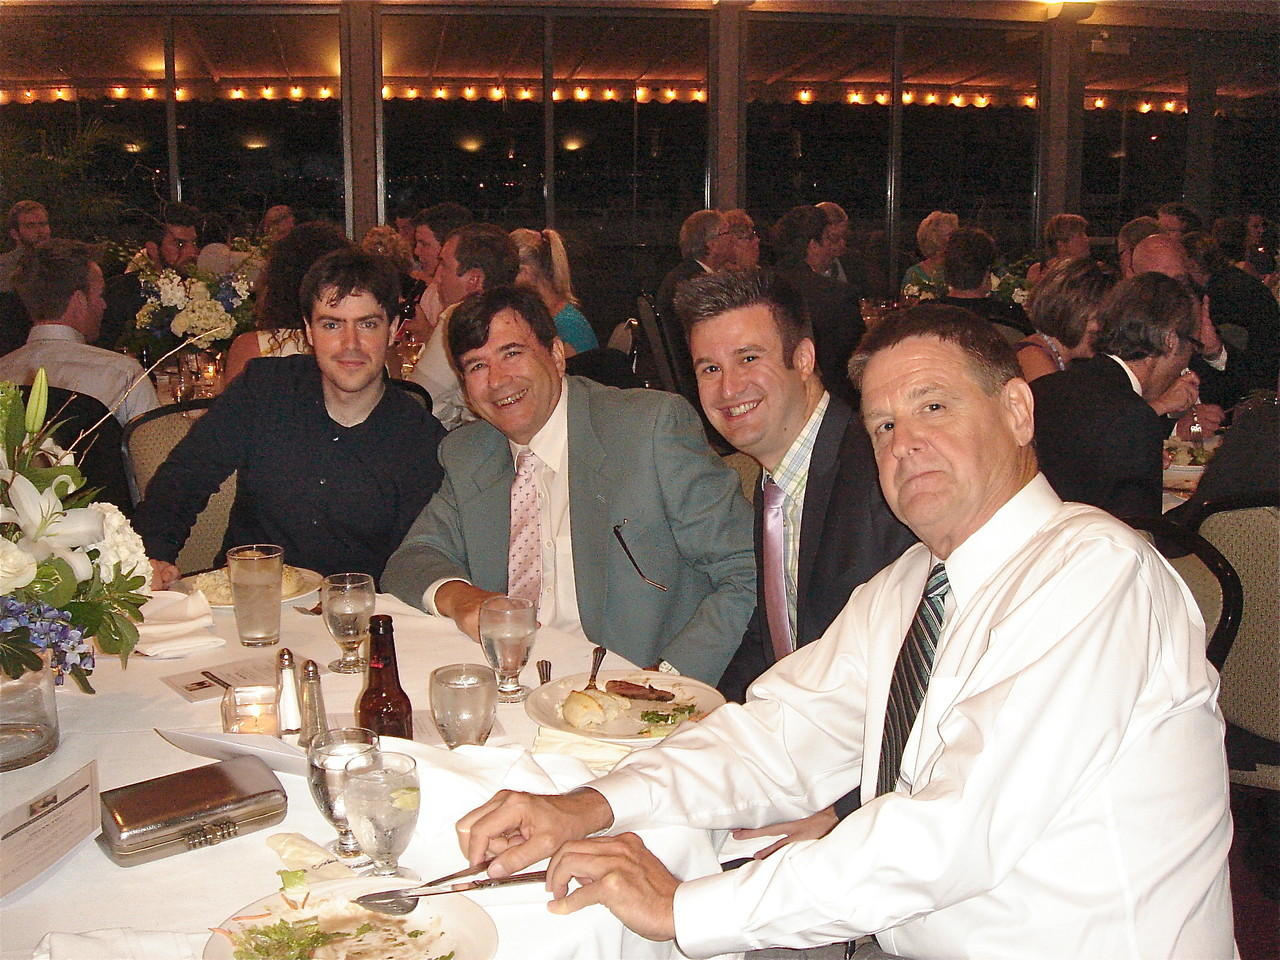 James, John, Chris, & Tom